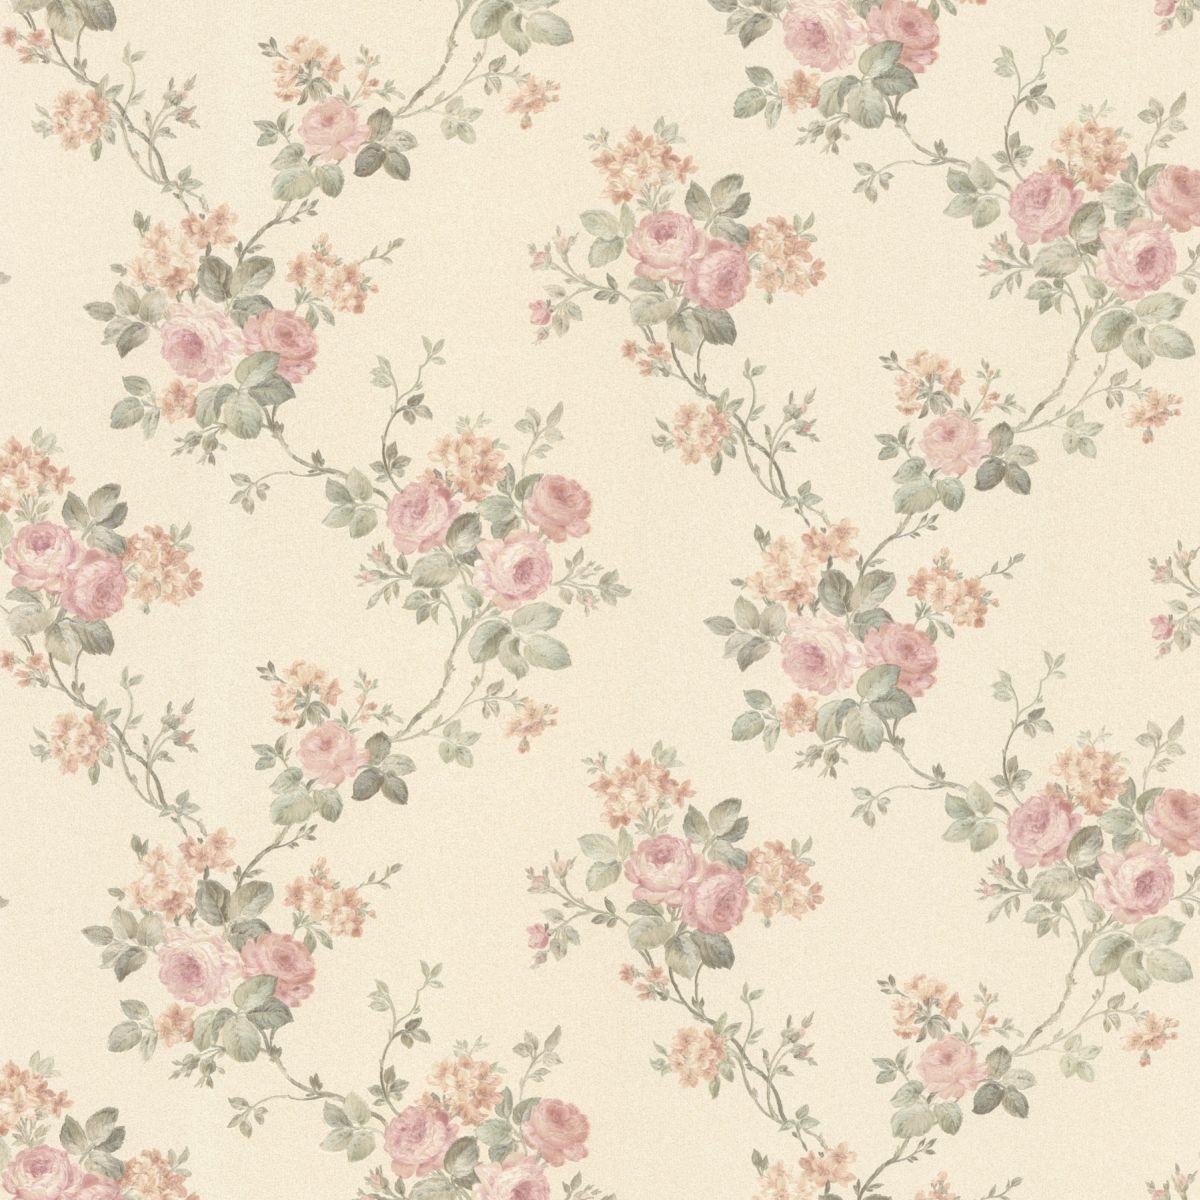 antique rose wallpaper wallpapersafari. Black Bedroom Furniture Sets. Home Design Ideas